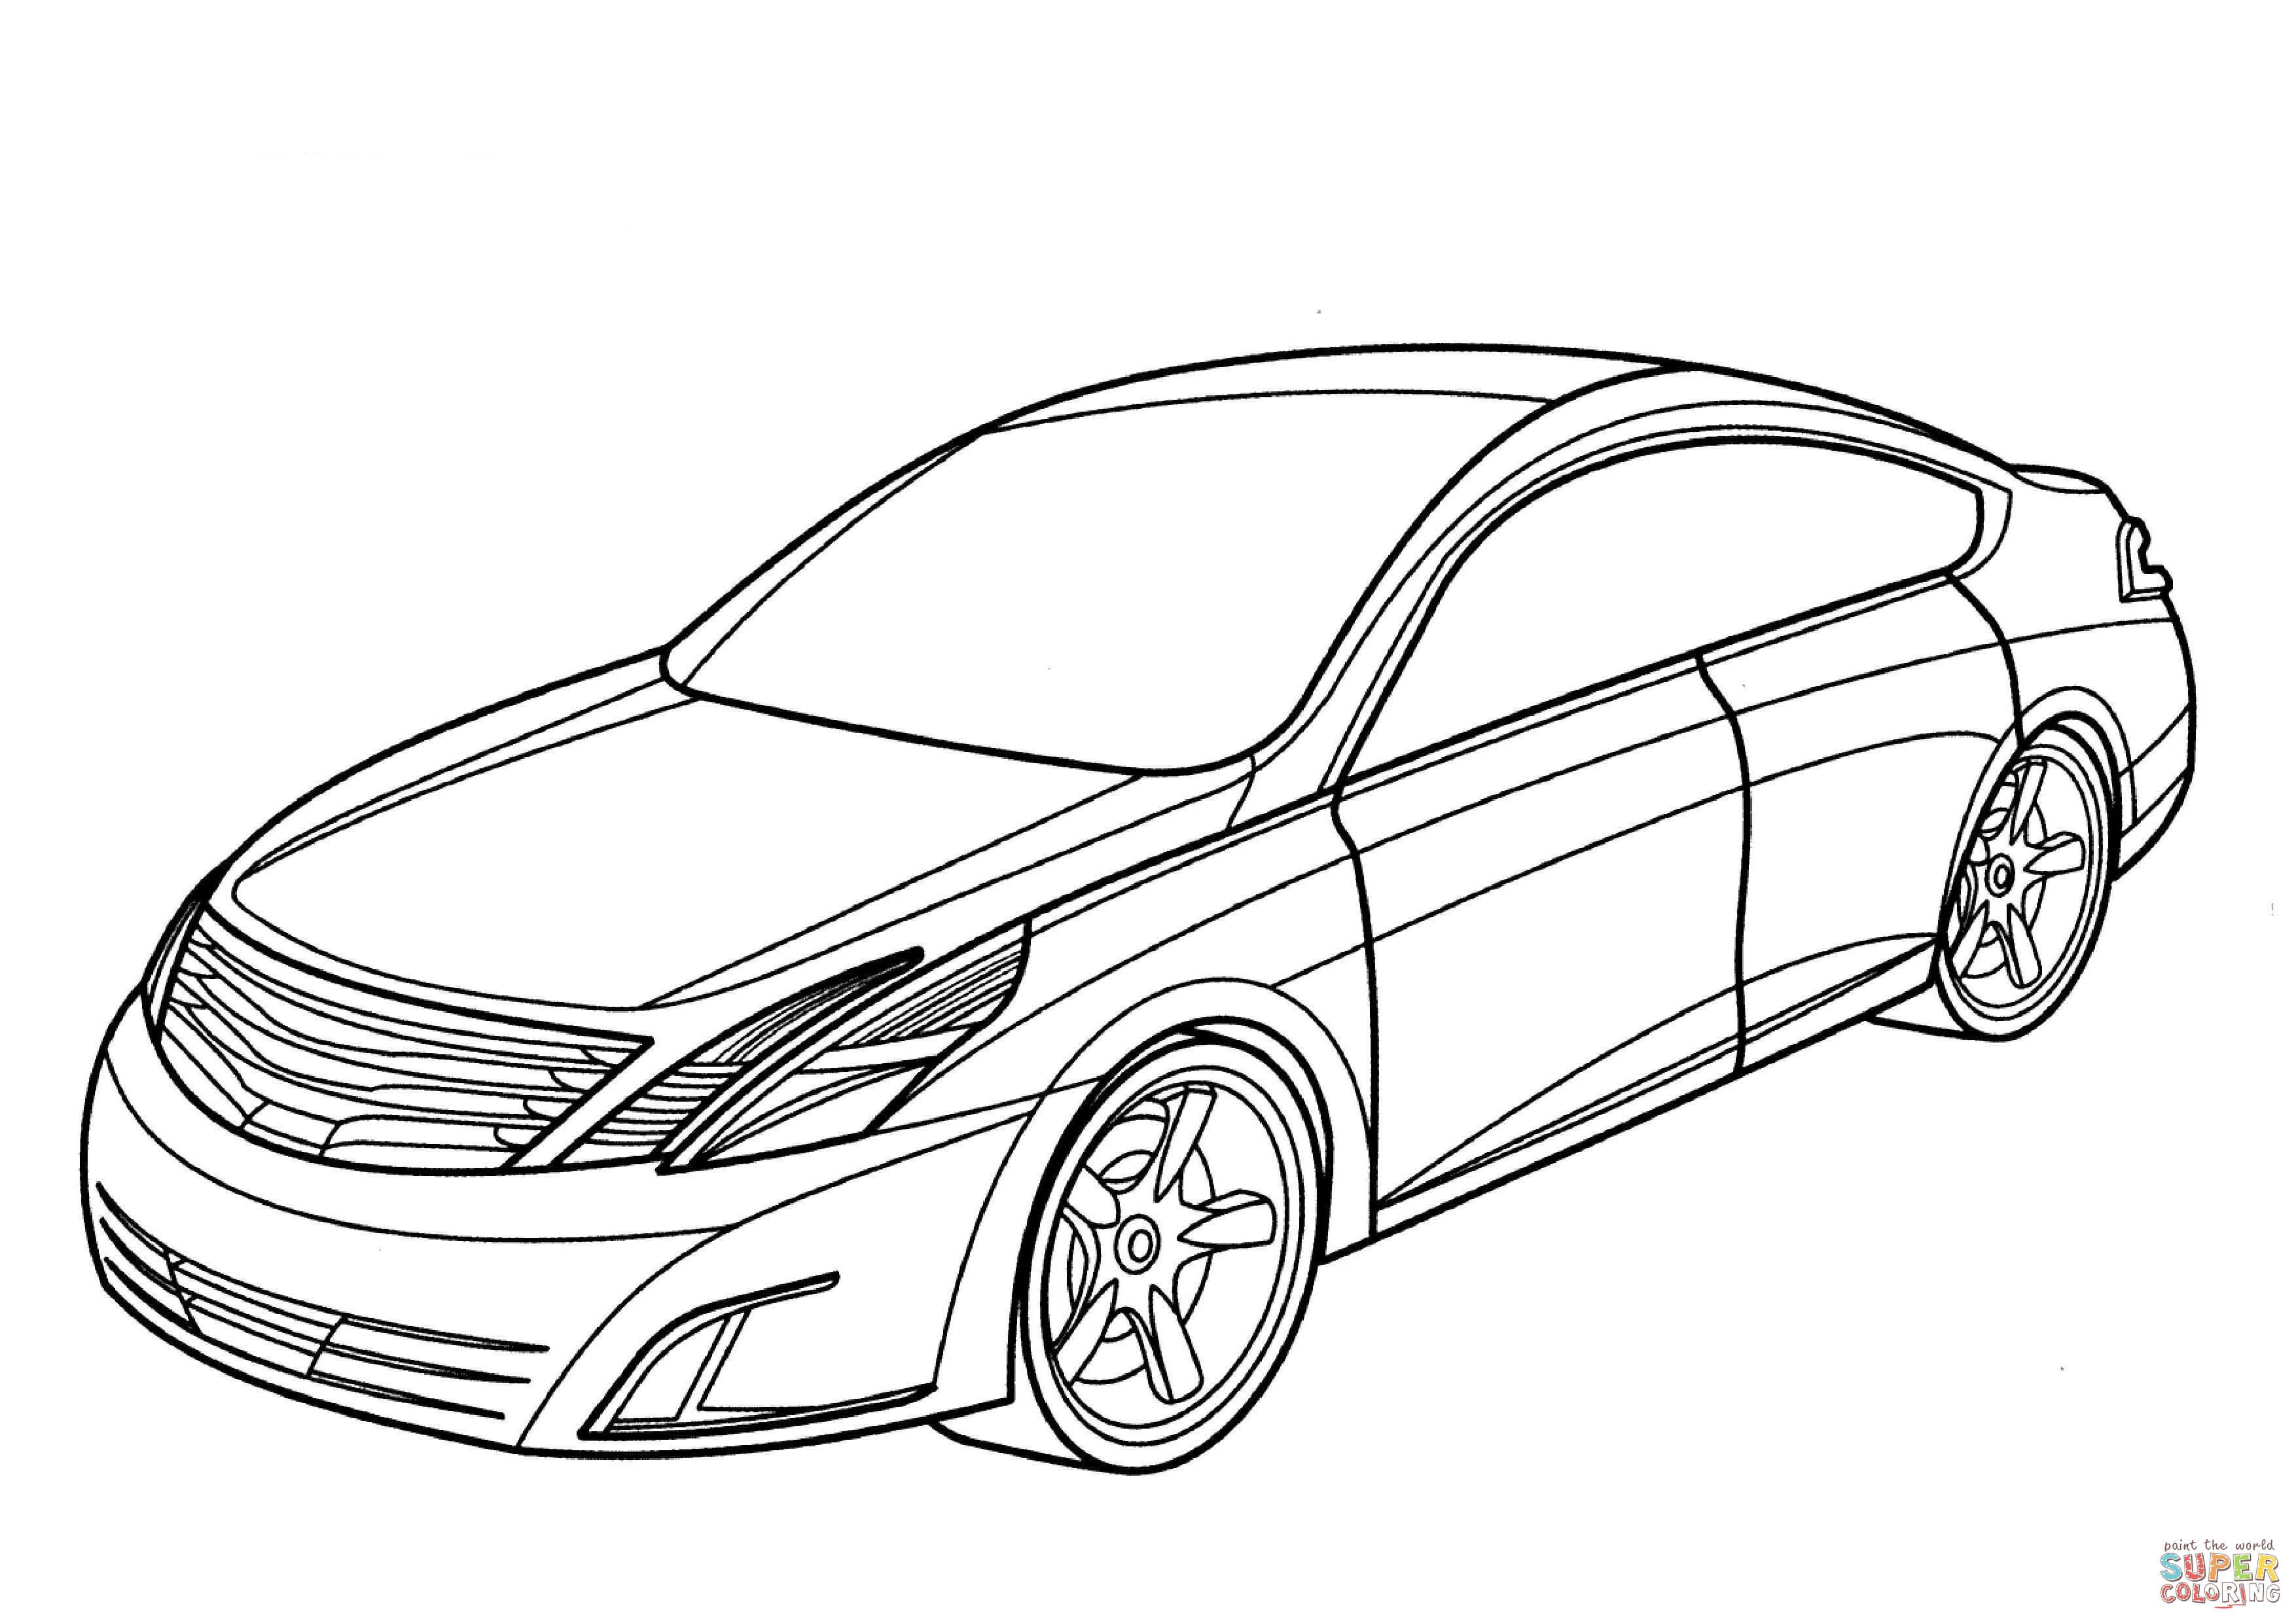 Nissan Gtr Drawing At Getdrawings